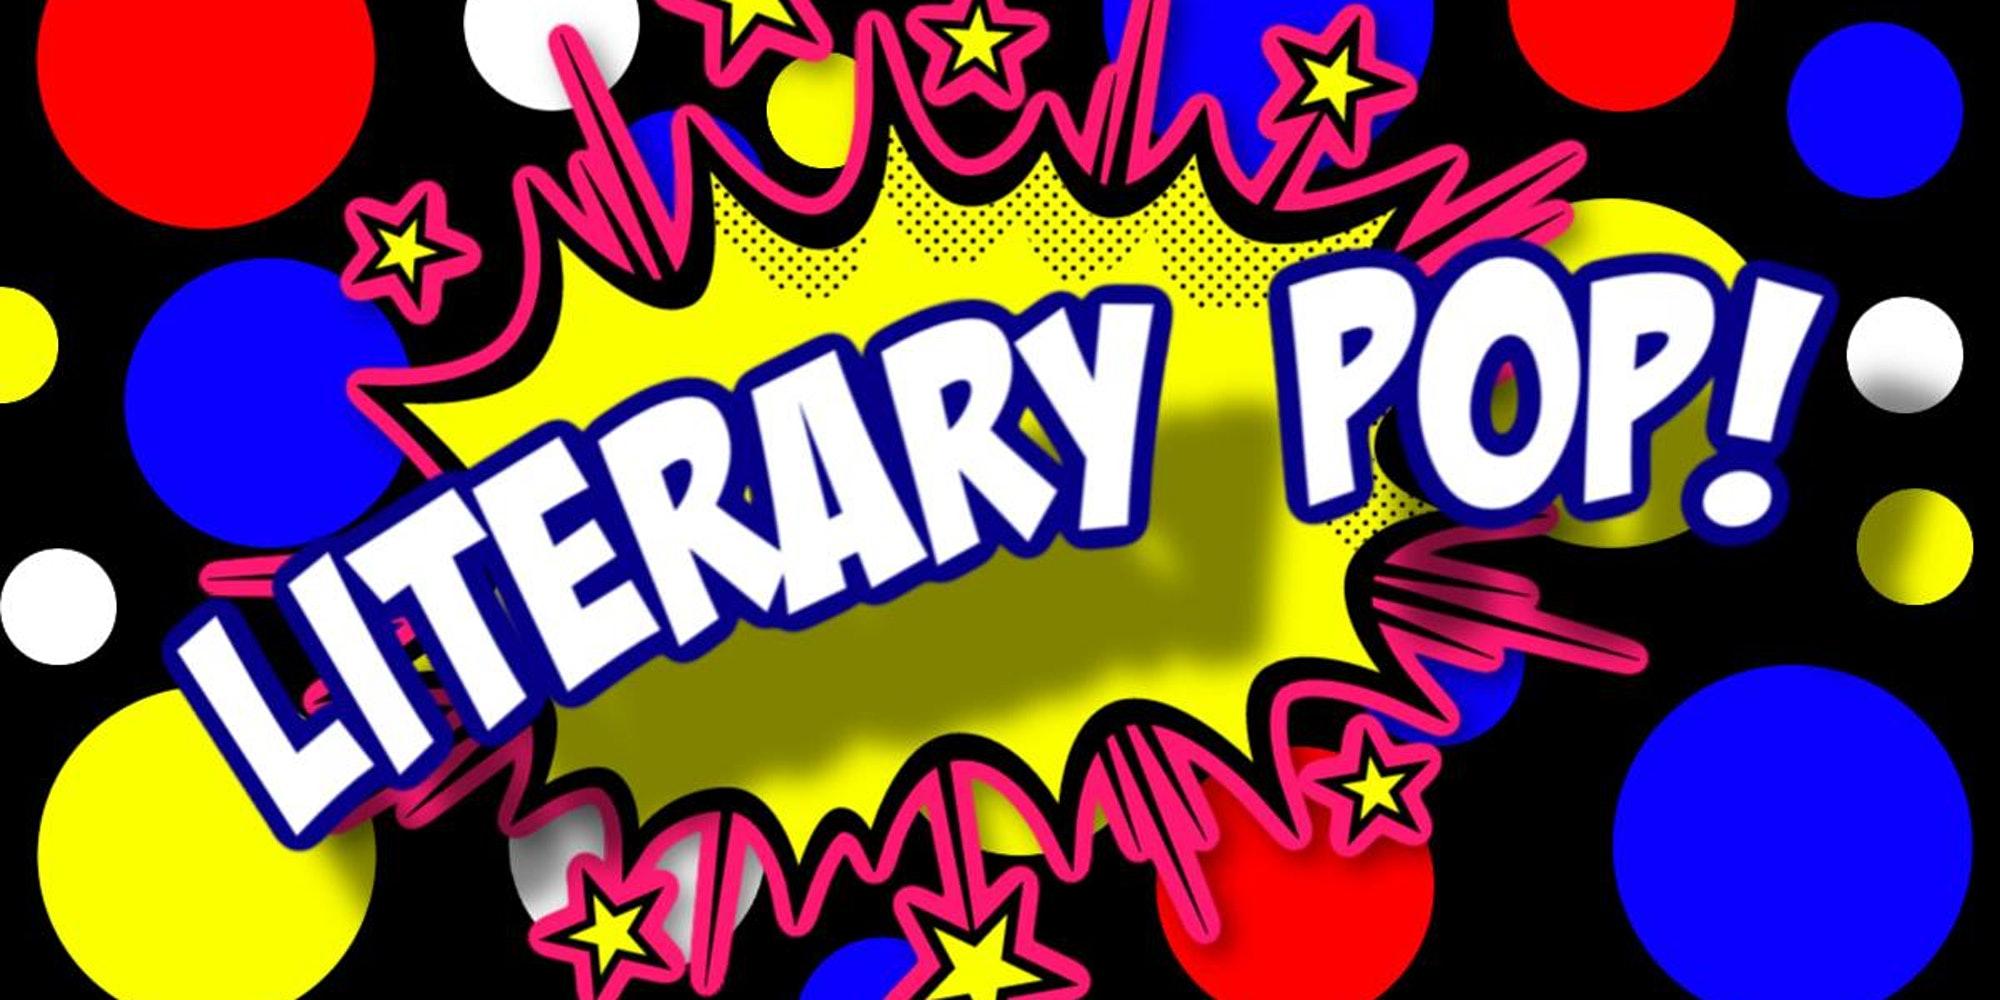 Literary Pop!